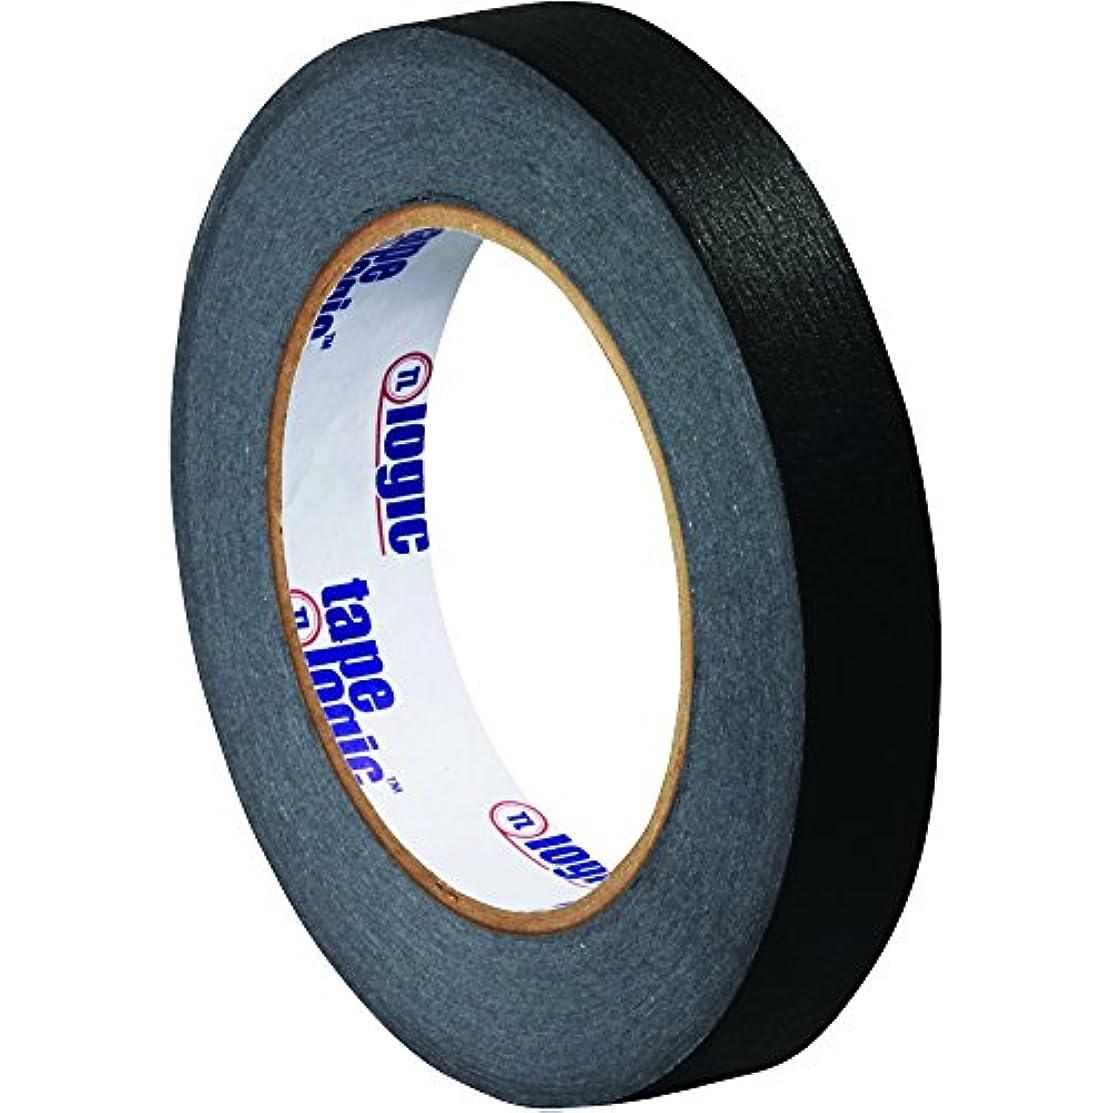 BOX USA BT93400312PKB Tape Logic Masking Tape, 3/4